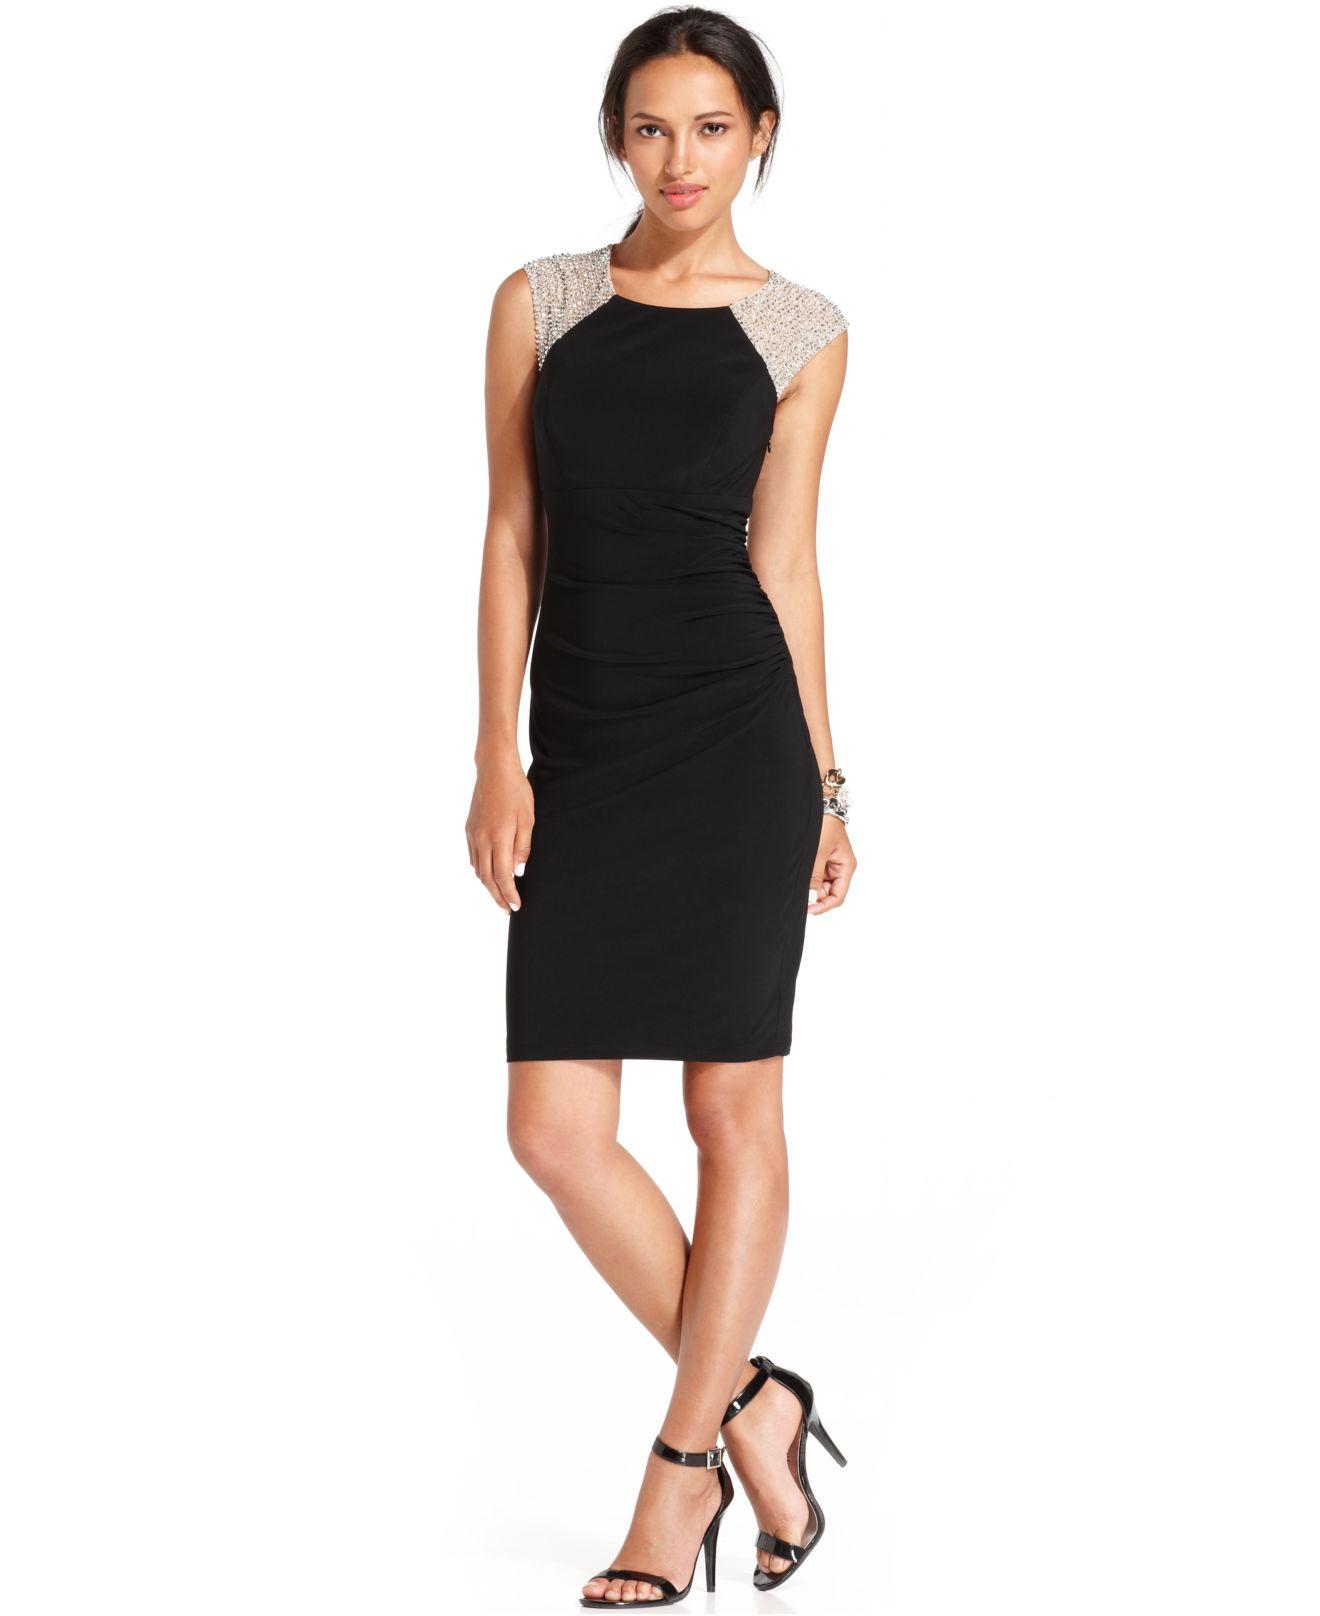 Xscape Sleeveless Studded Blouson Dress in Beige (Black)   Lyst